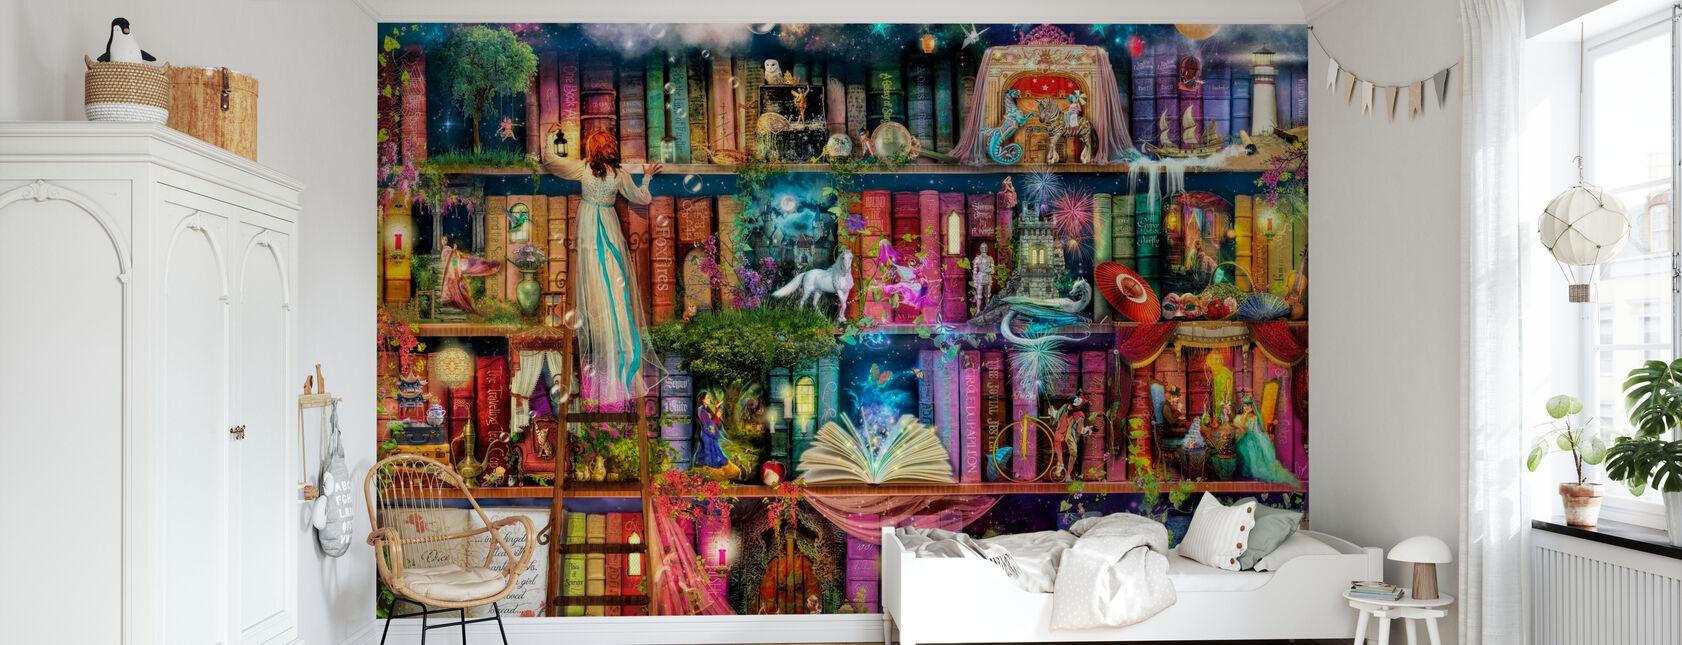 Treasure Hunt Book Shelf - Wallpaper - Kids Room